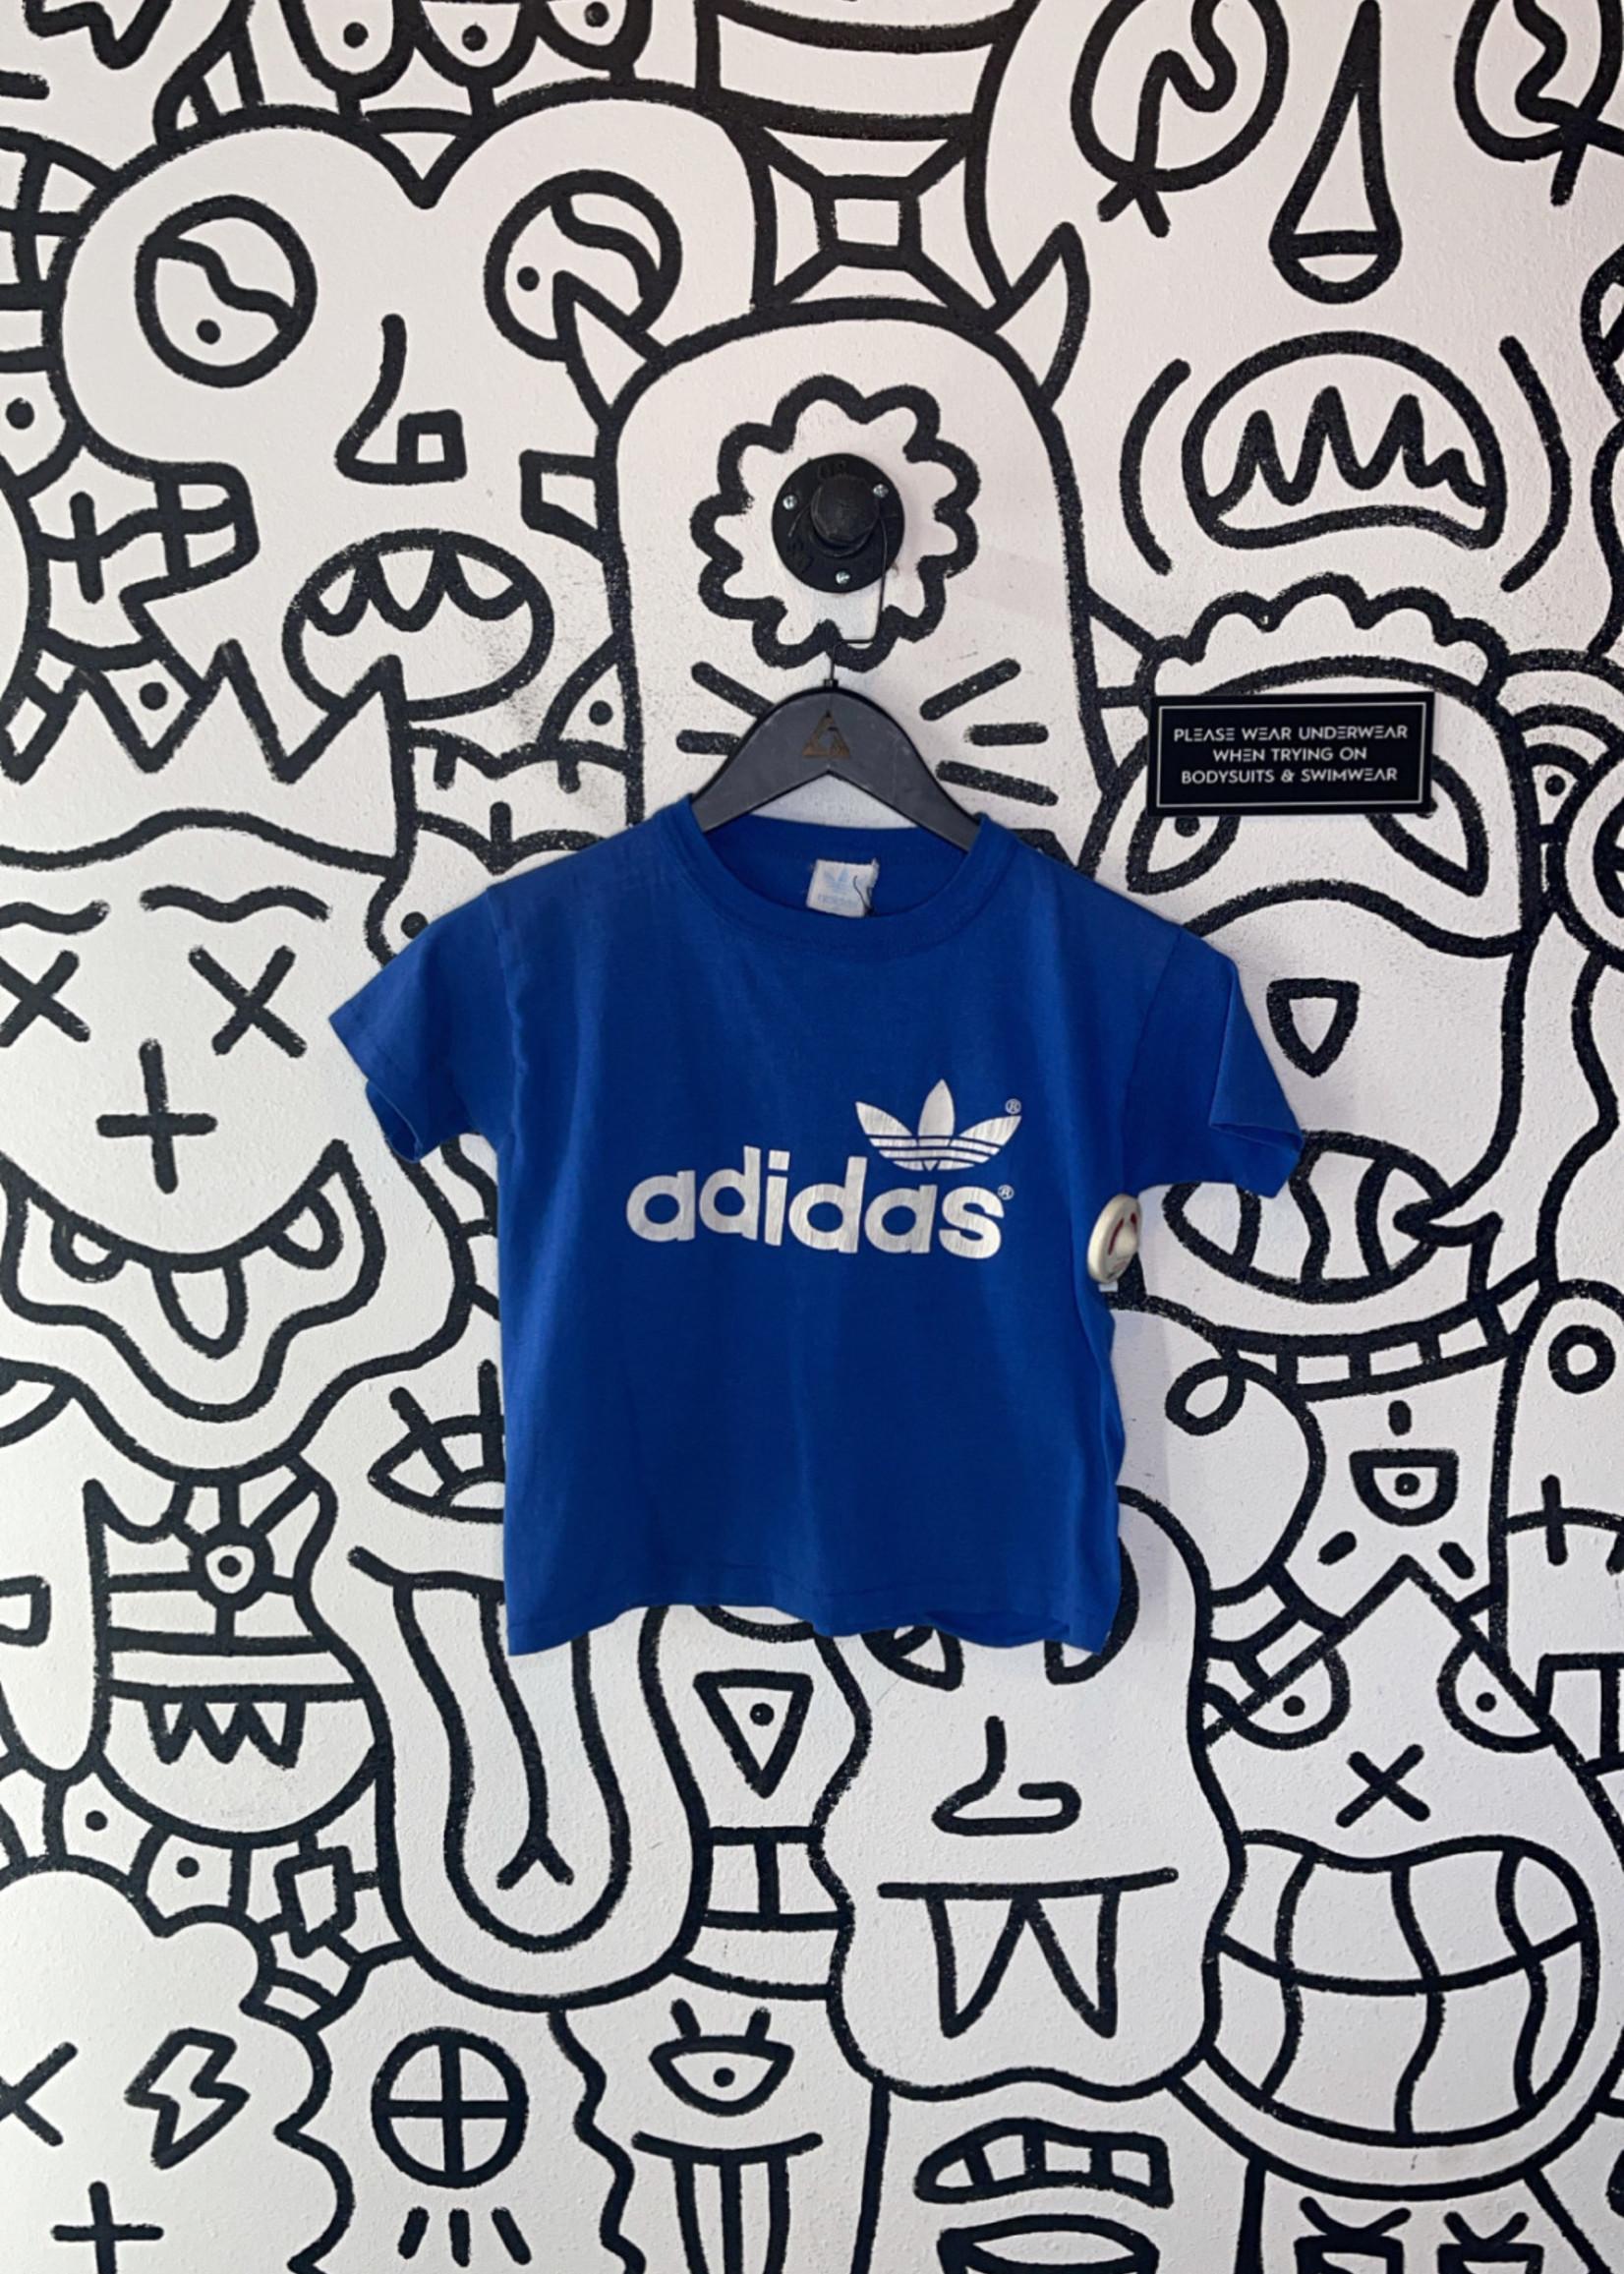 Adidas Vintage Blue Baby Tee XS